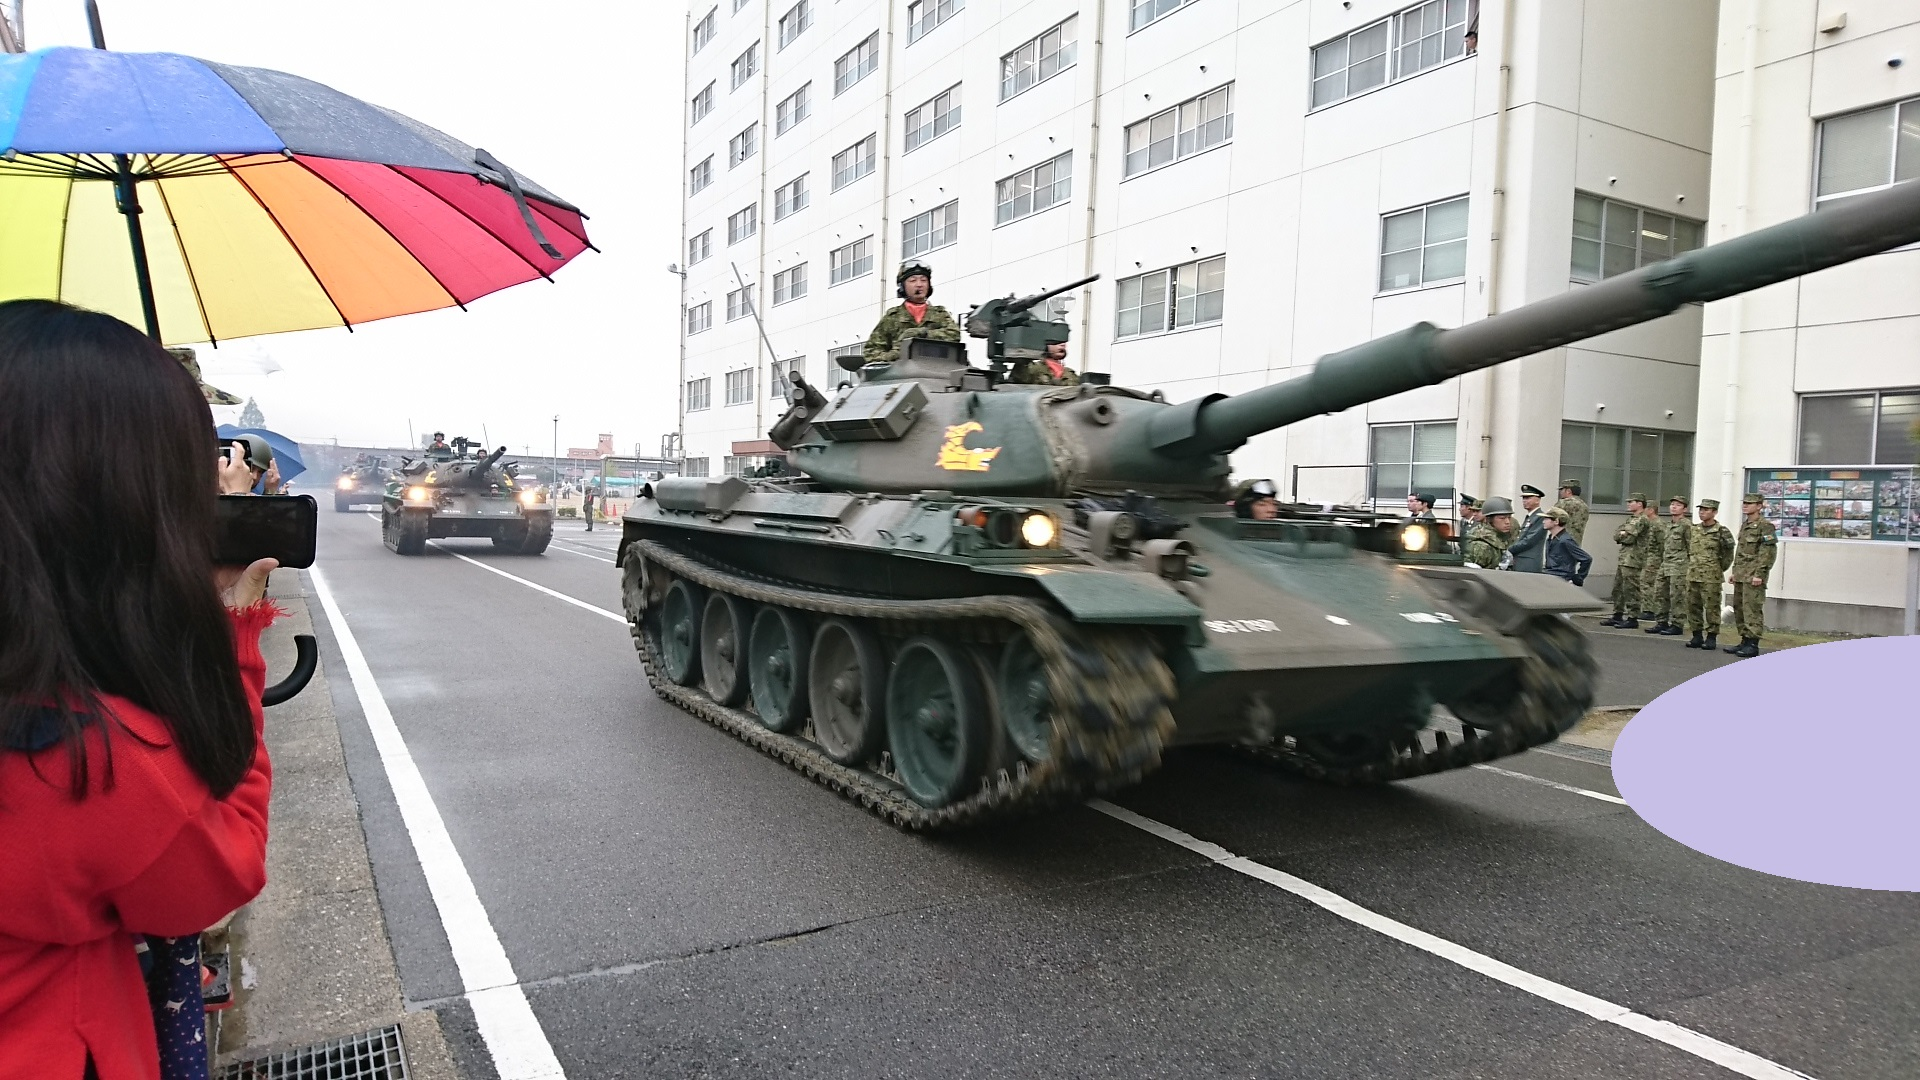 2017.10.28 守山駐屯地 (31) 74式戦車の行進 1920-1080